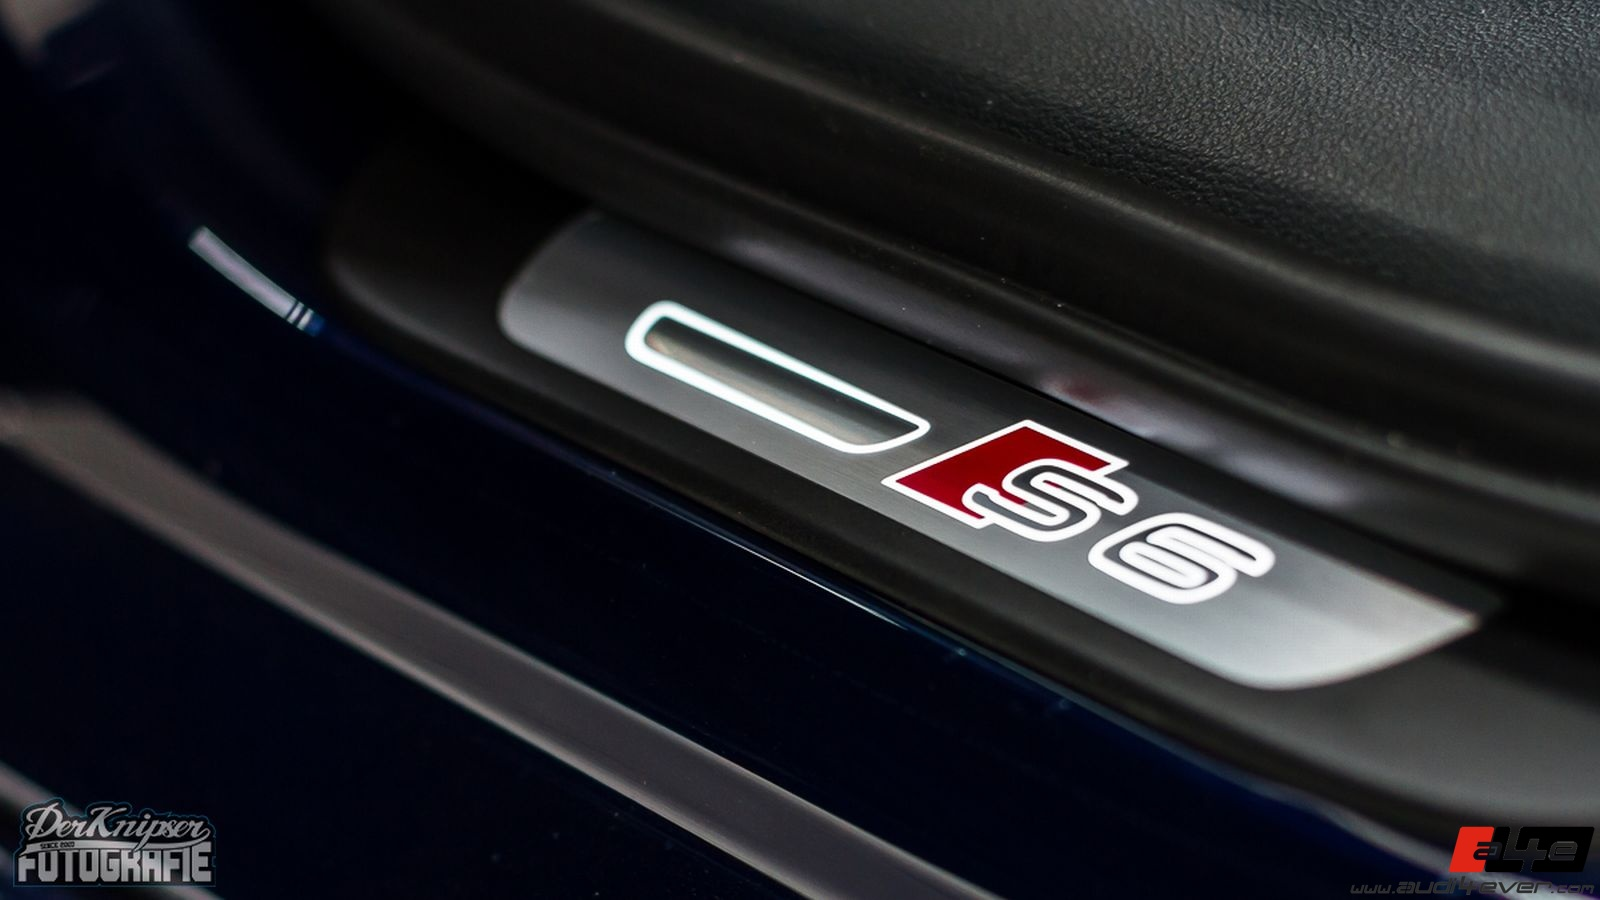 A4e Gallery Audi A6 C7 Audi S6 C7 Avant Fotoshooting